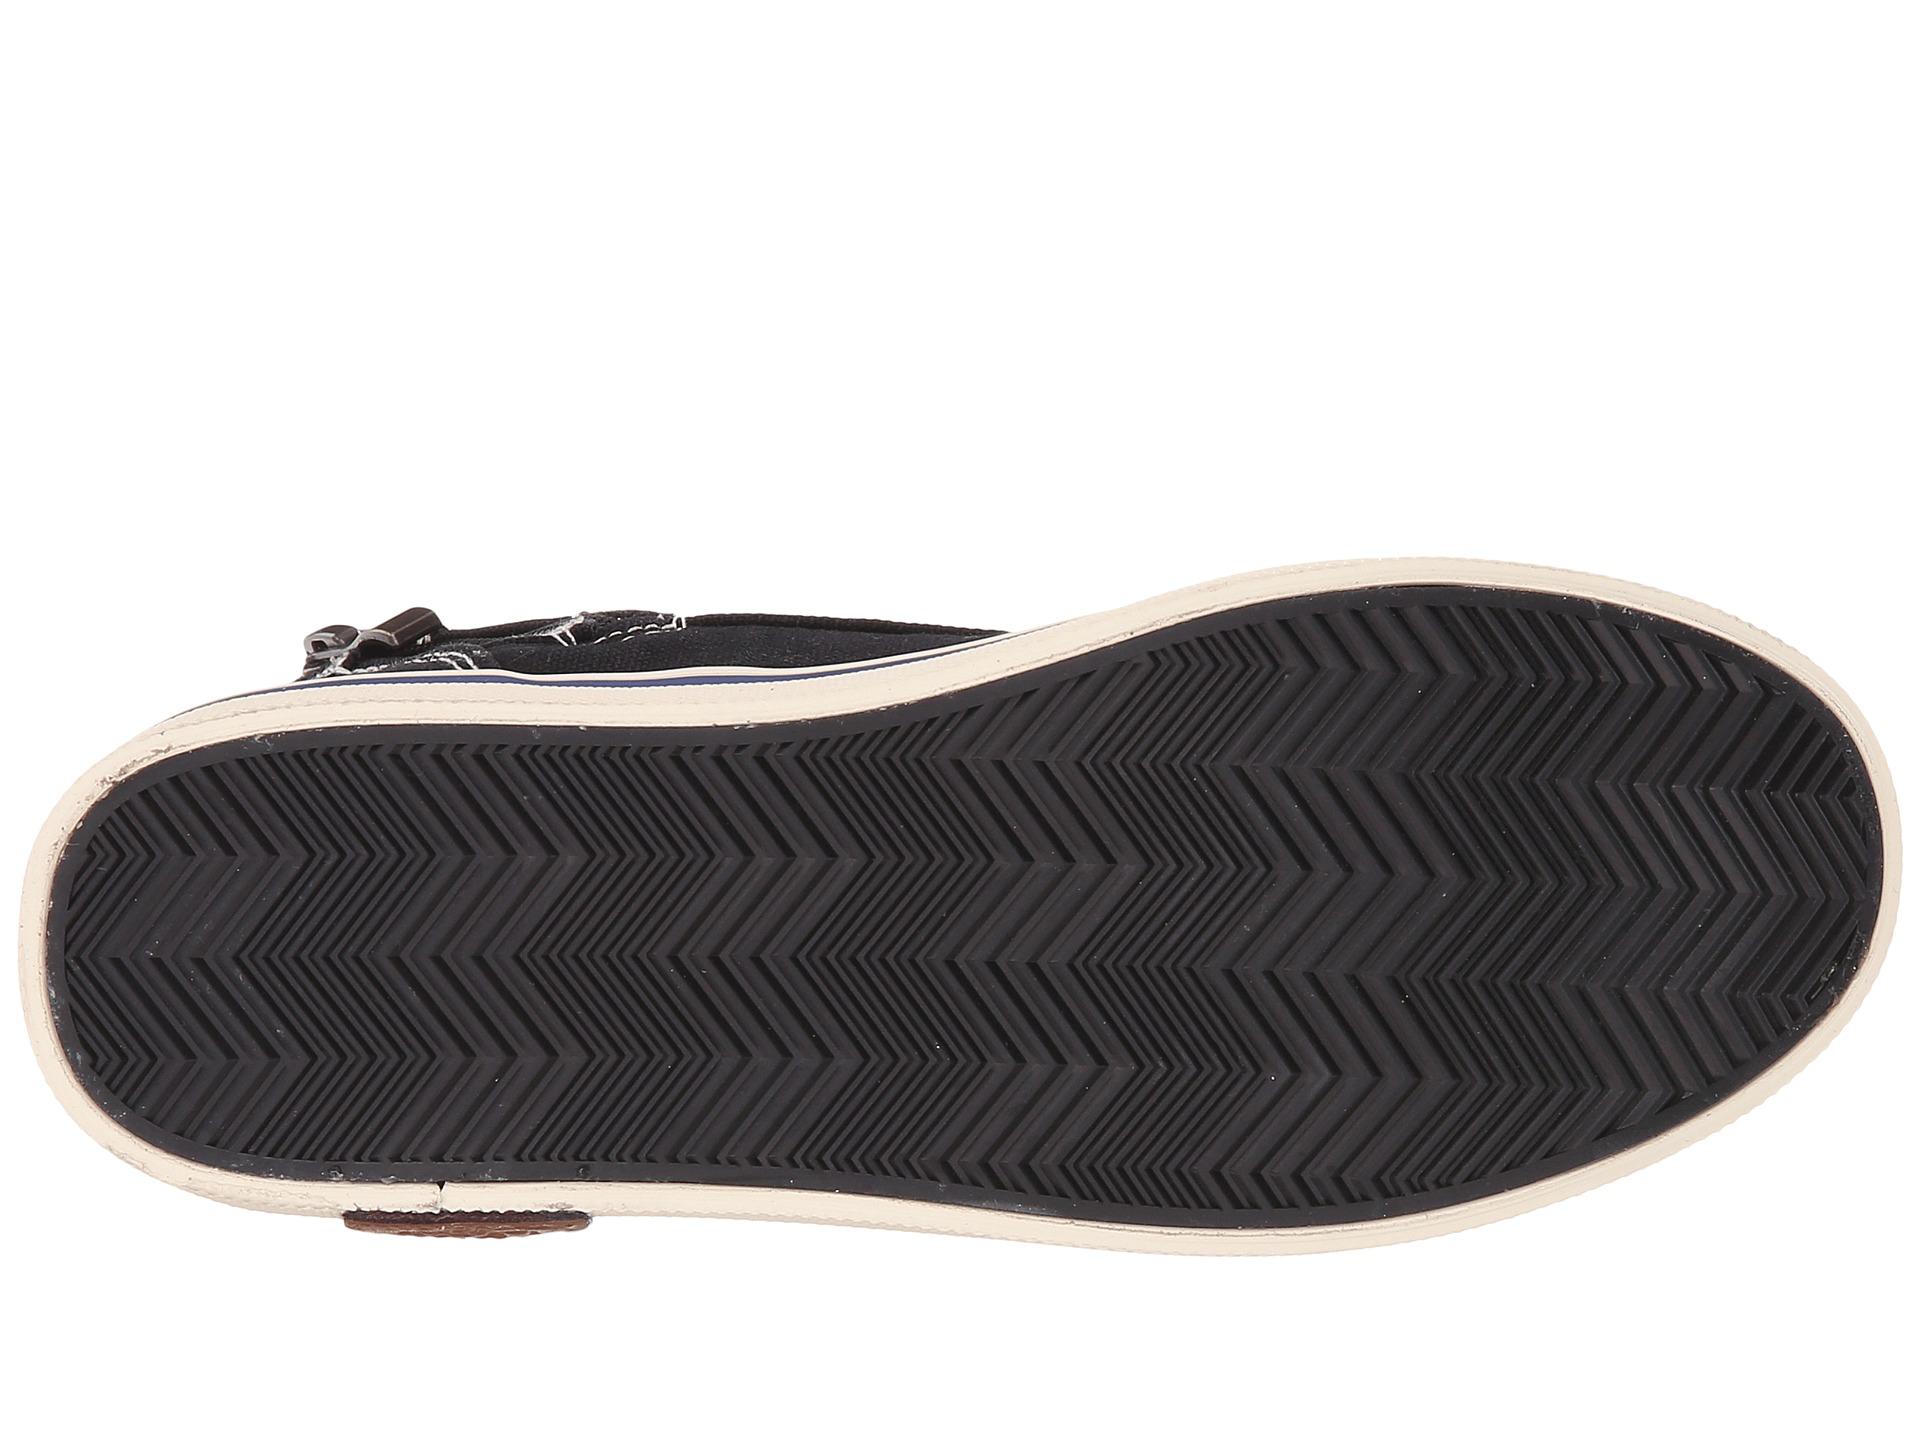 Le Danzabe Ugg Chaussures Pour Femmes